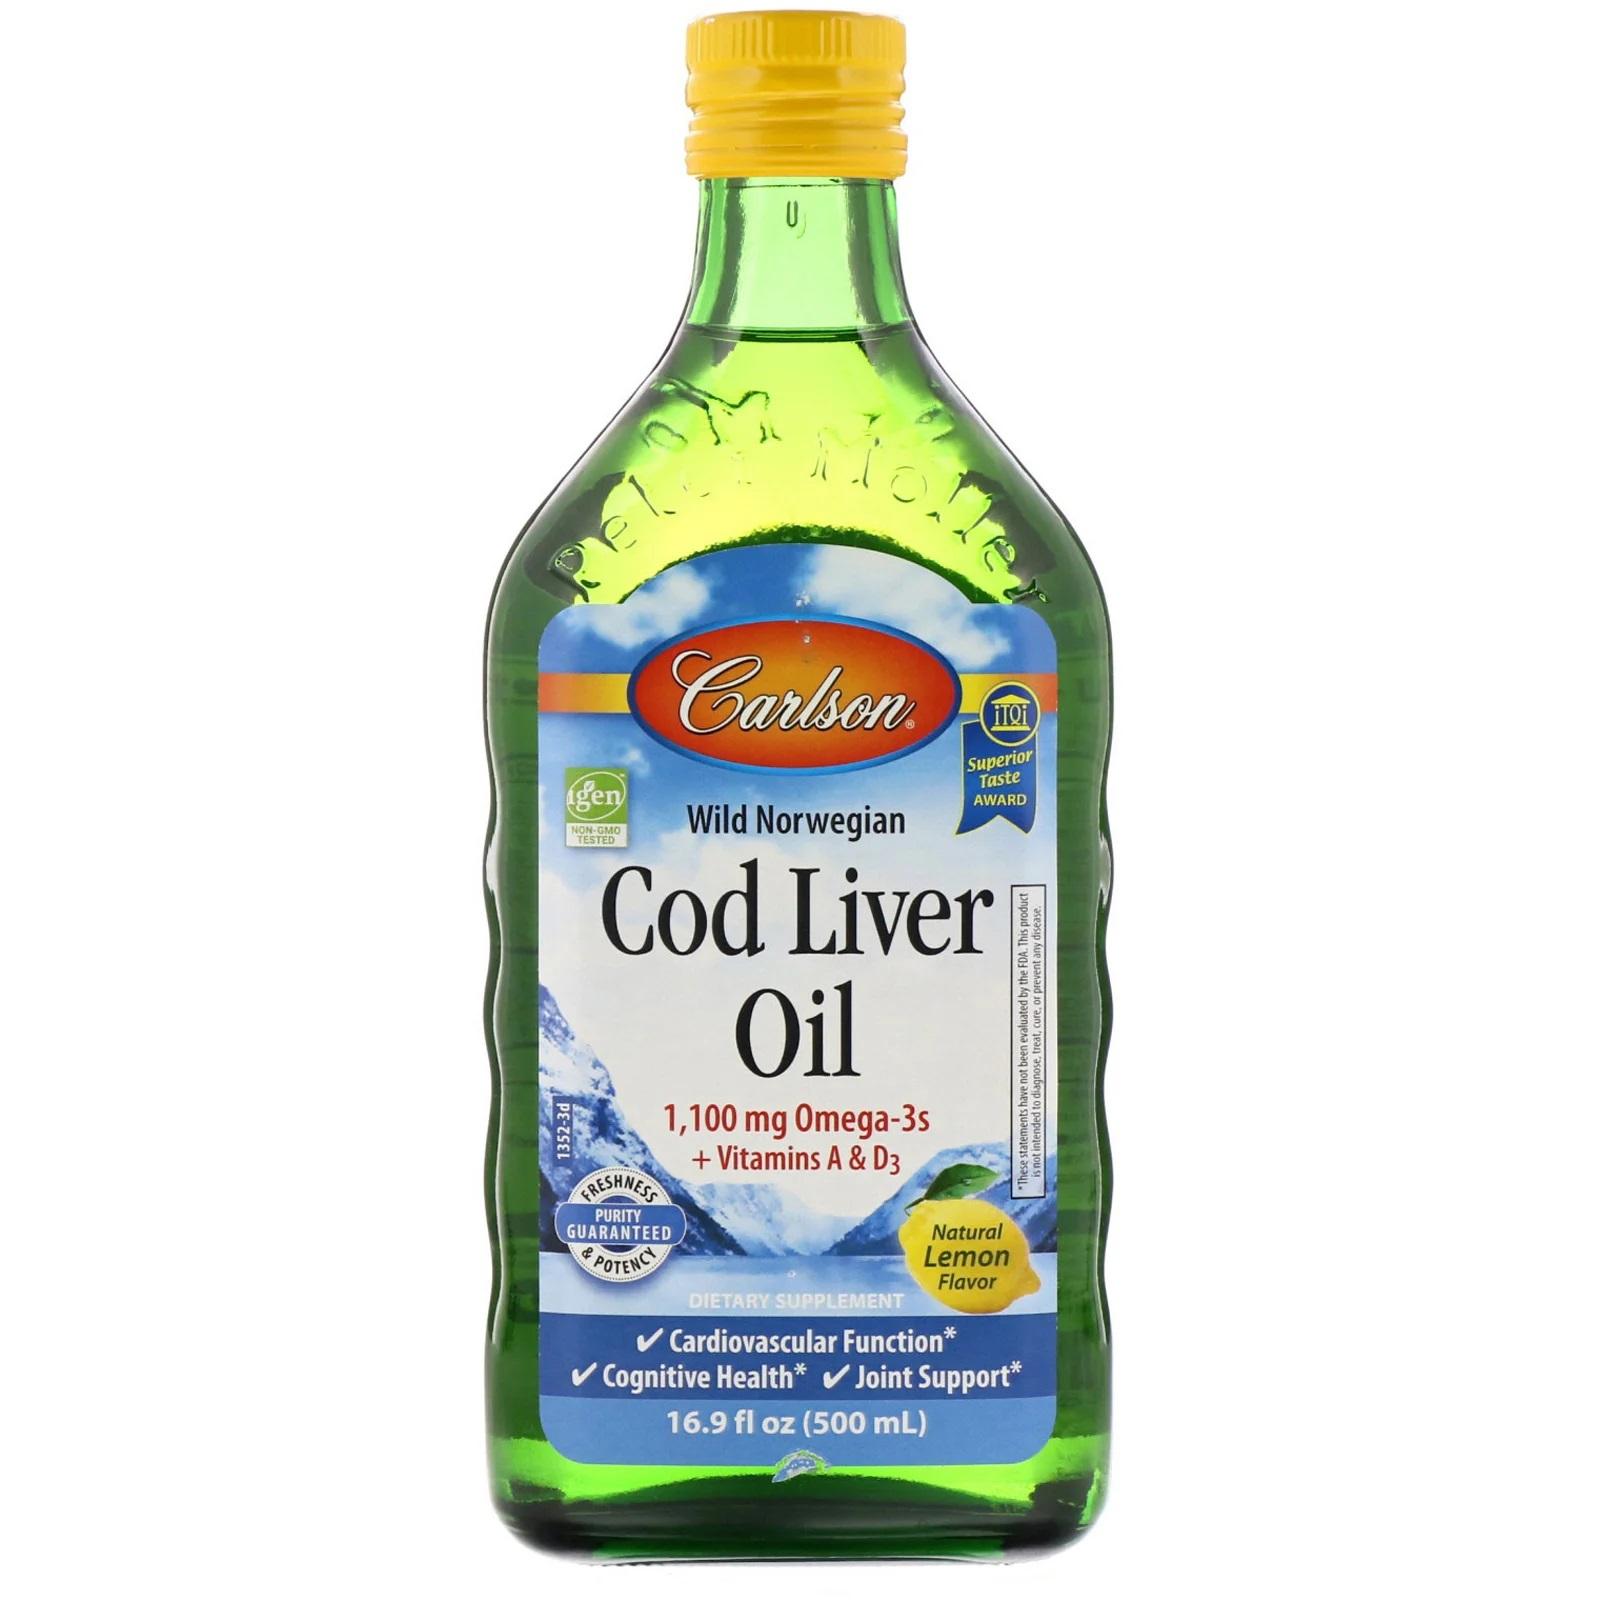 Image of Wild Norwegian Cod Liver Oil- Natural Lemon (500 ml) - Carlson Laboratories 0088395013522